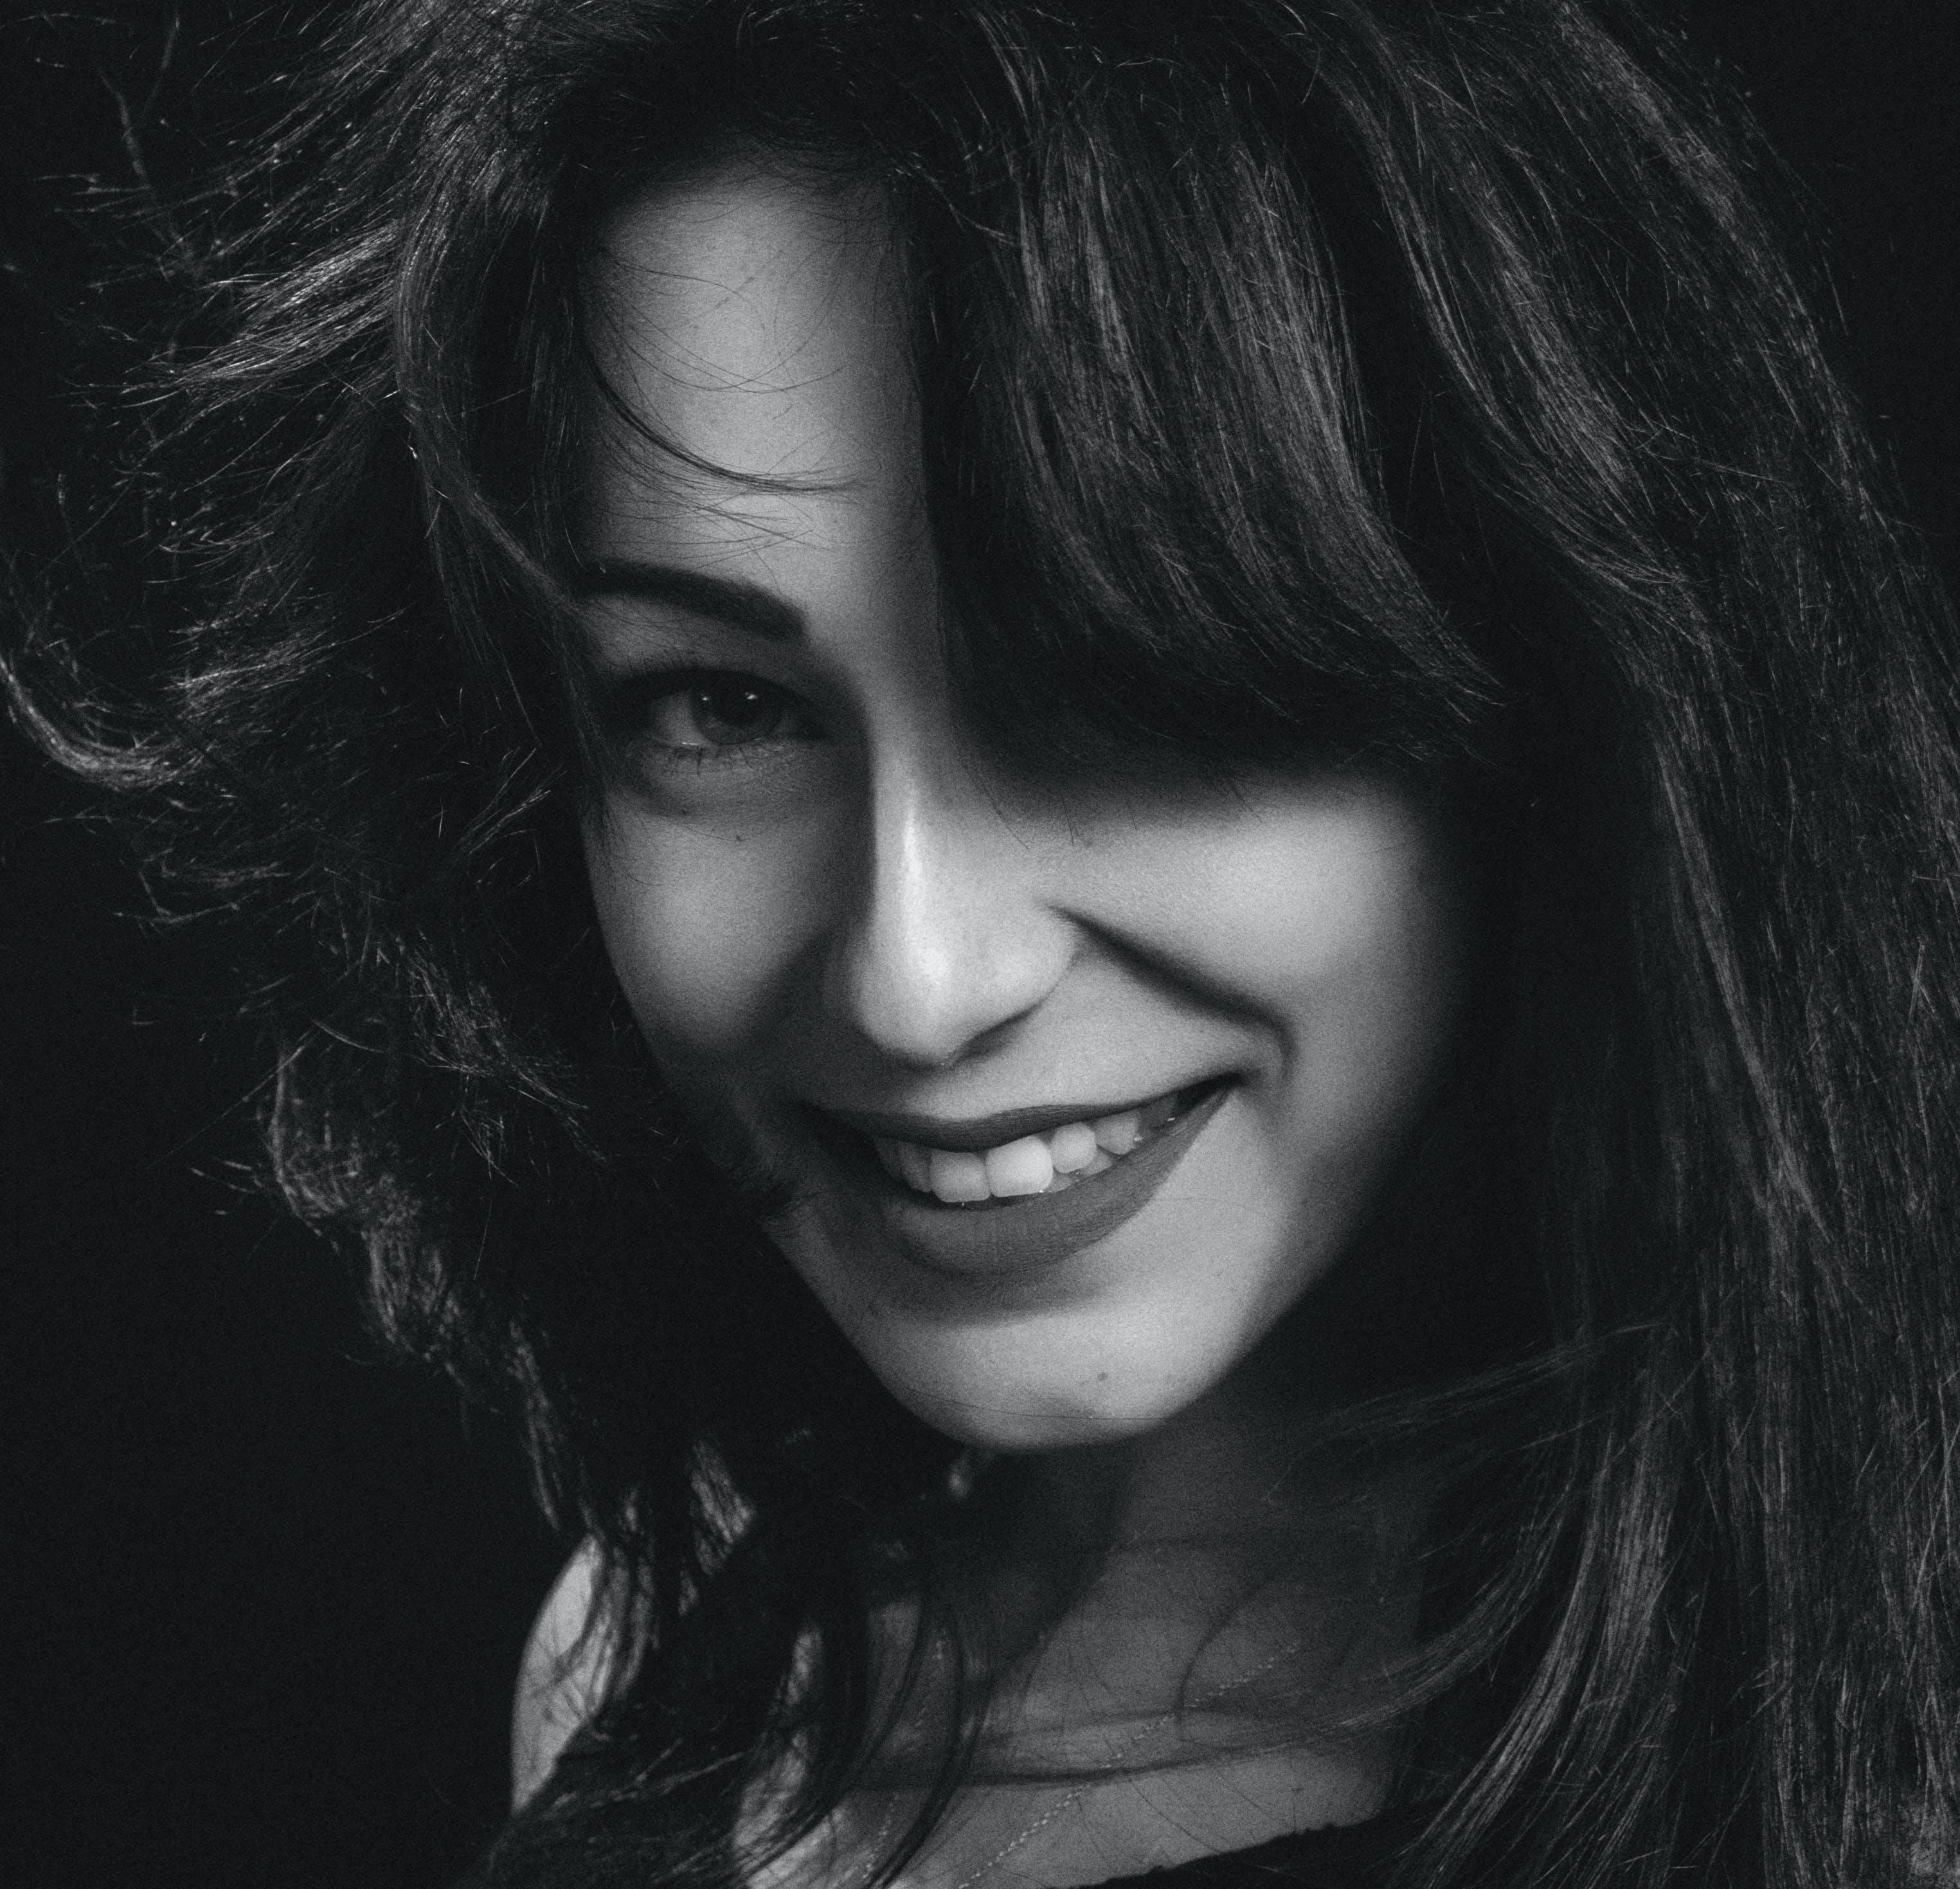 Greyscale Photo of Woman